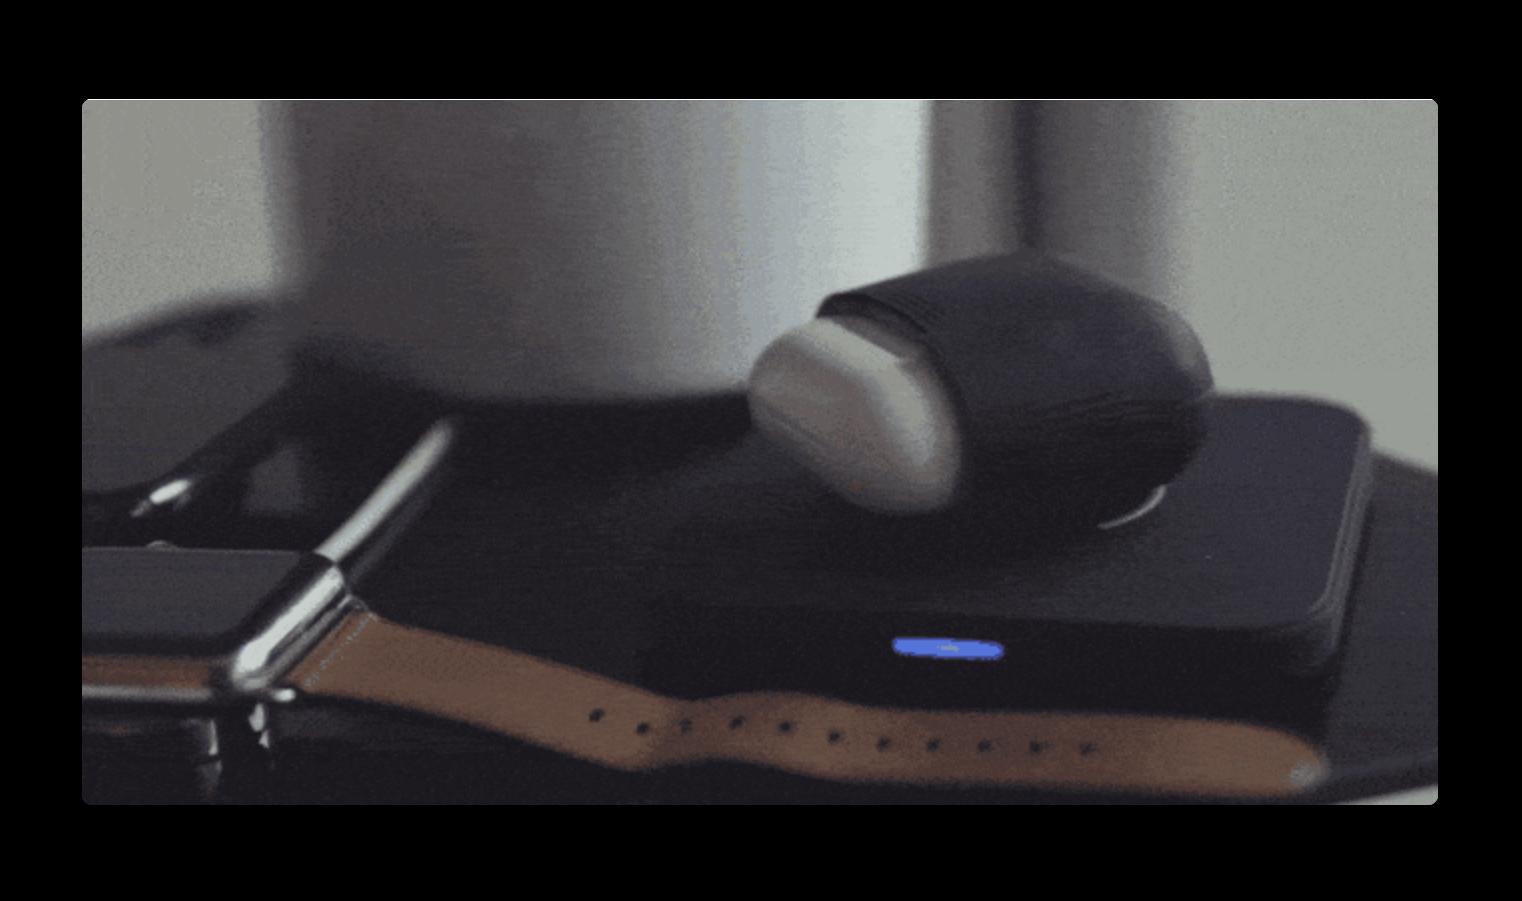 Kickstarter、Apple AirPodsにワイヤレス充電を追加するケース